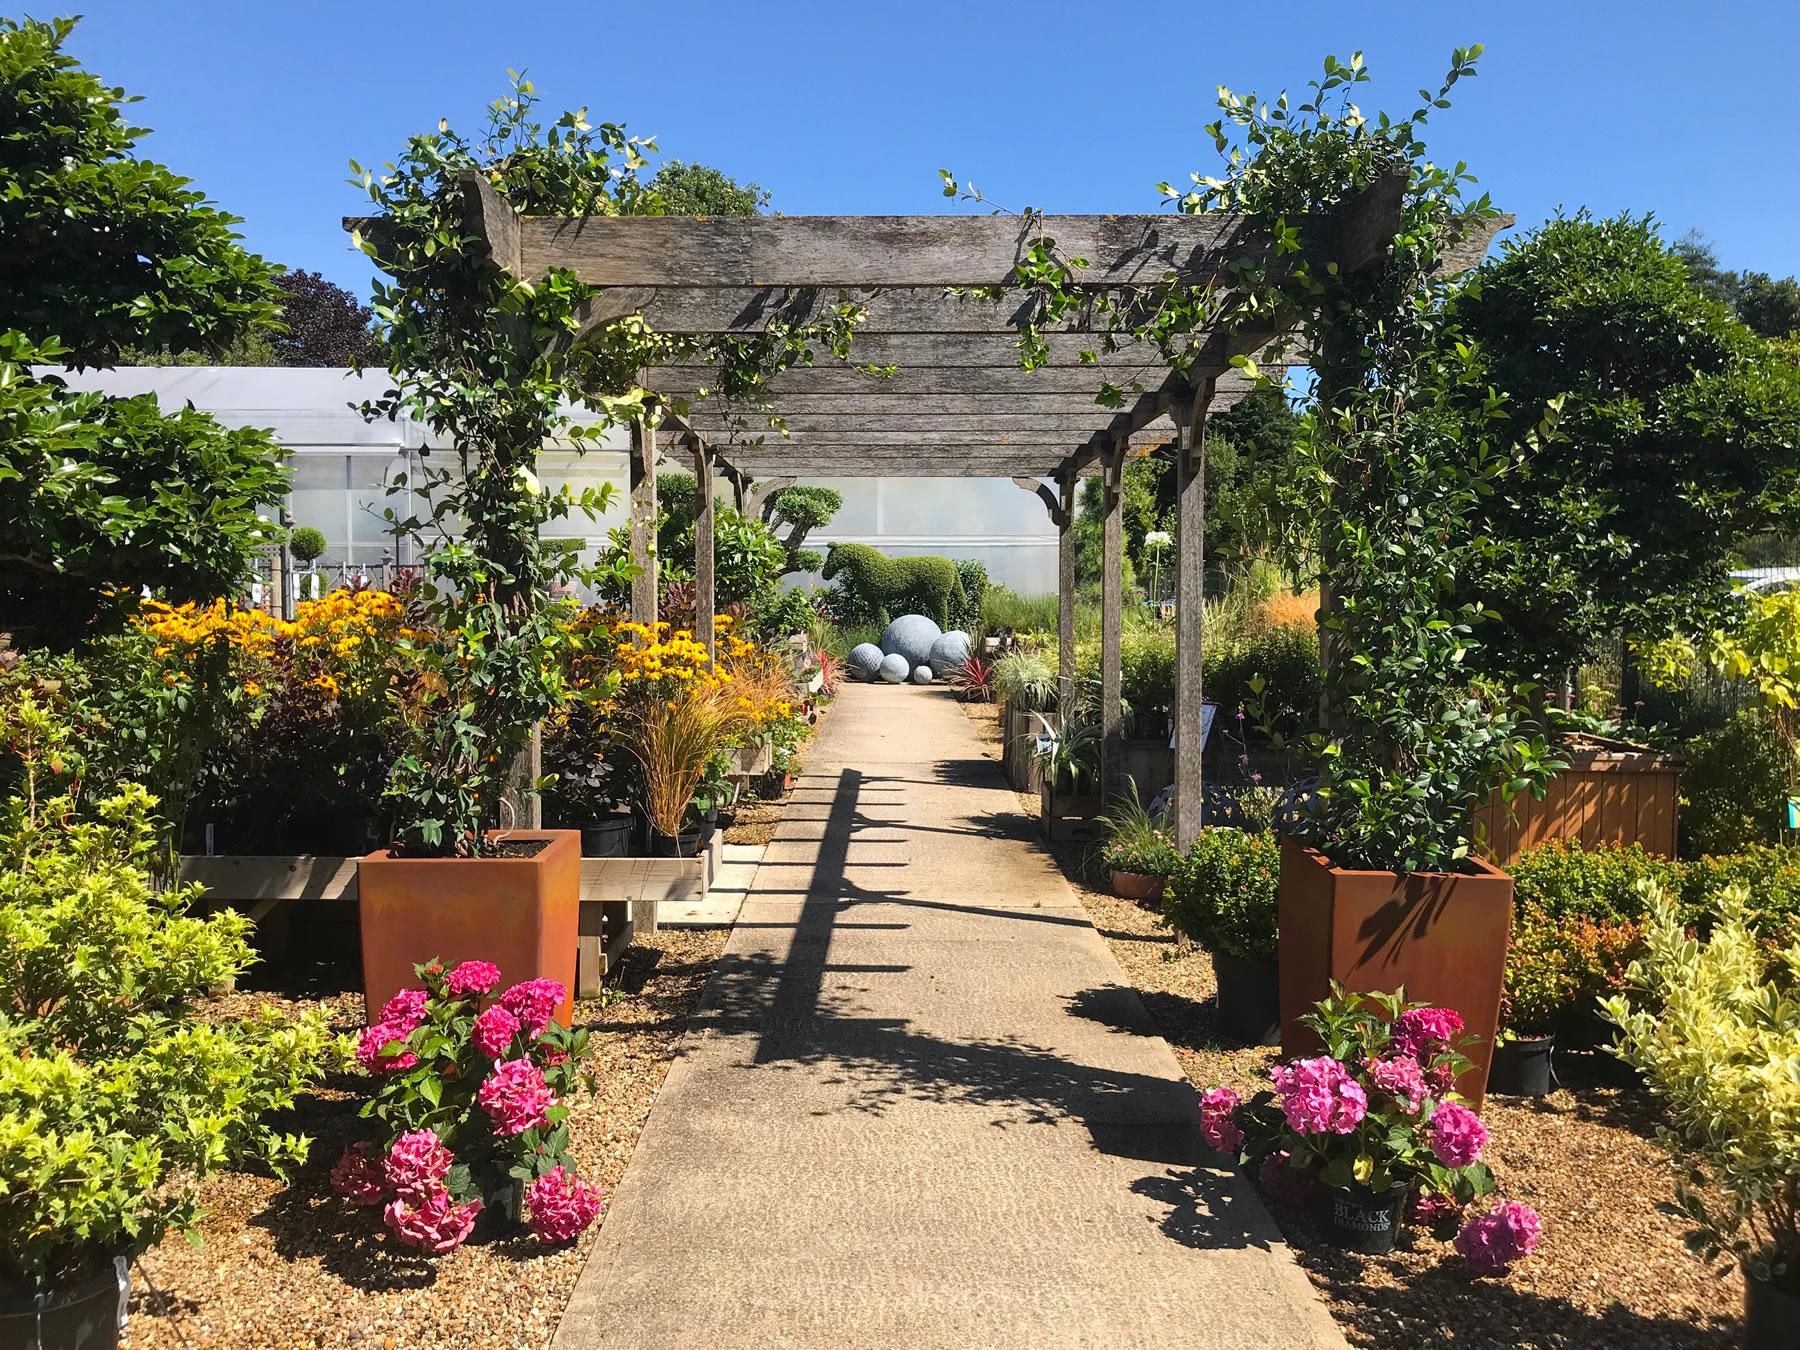 Clifton Nurseries - Garden Centre, Woburn Hill, Addlestone, near Weybridge Surrey